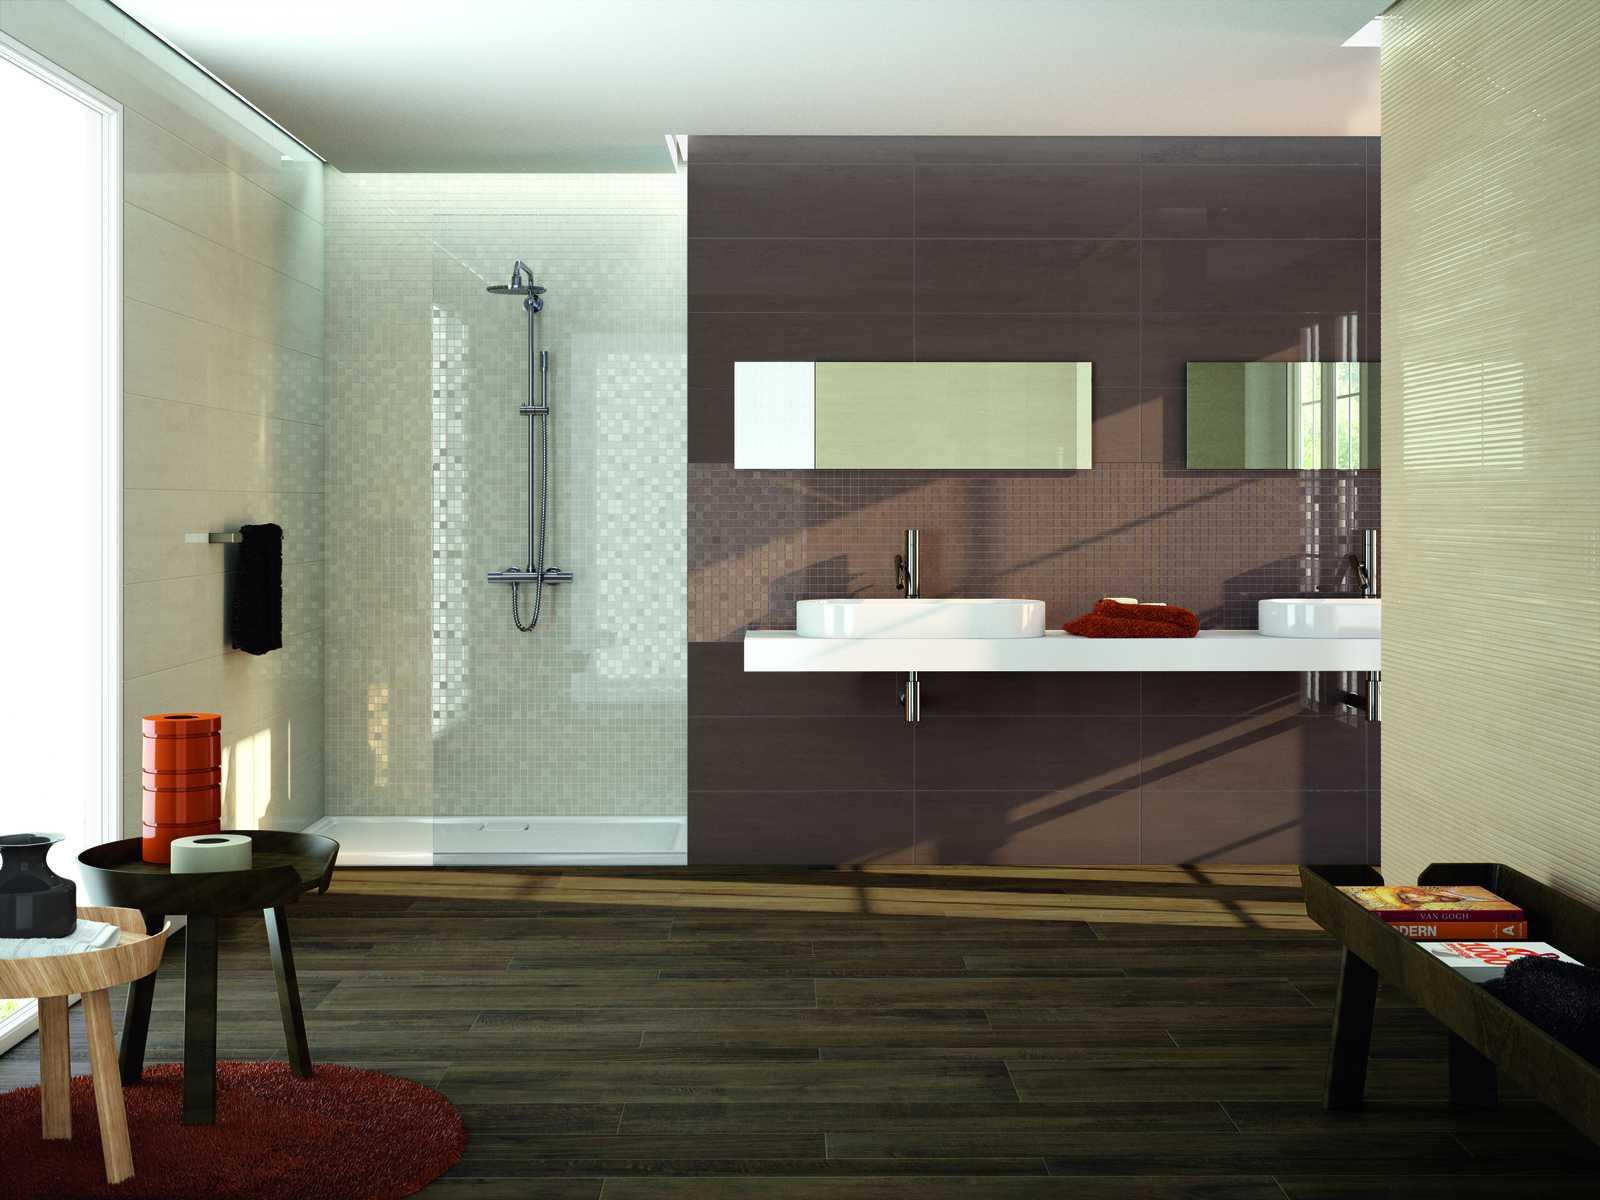 dressy bathroom porcelain stoneware marazzi. Black Bedroom Furniture Sets. Home Design Ideas